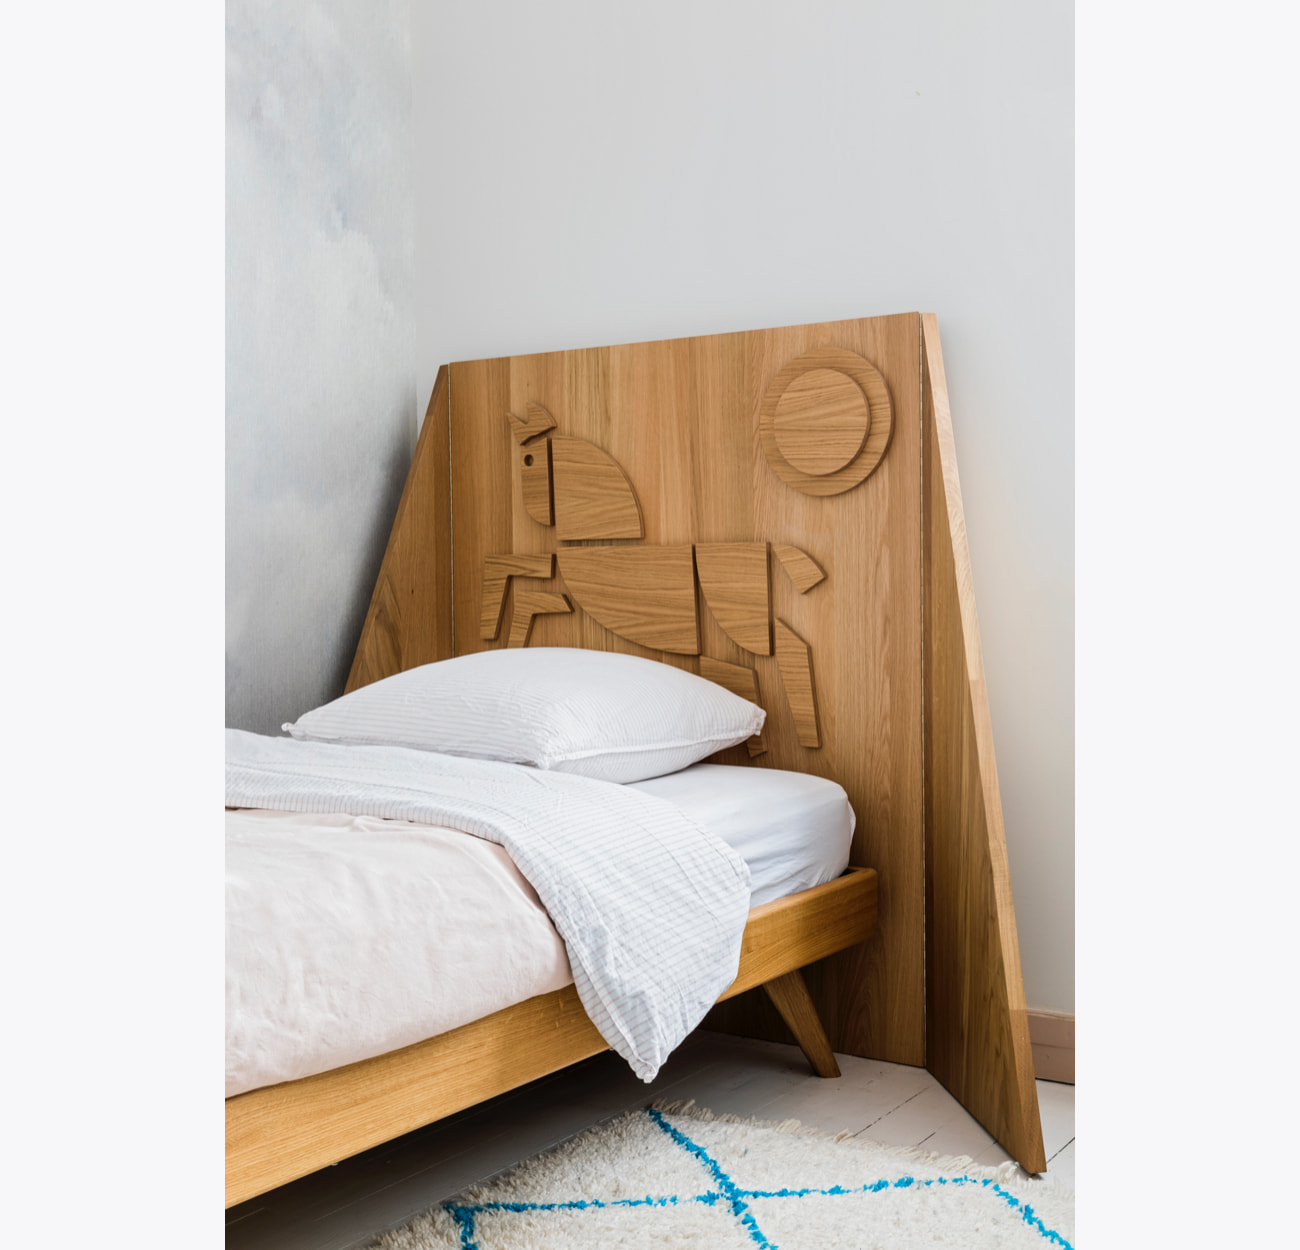 furniture-bed-headboard-horse-the-hansen-family-2